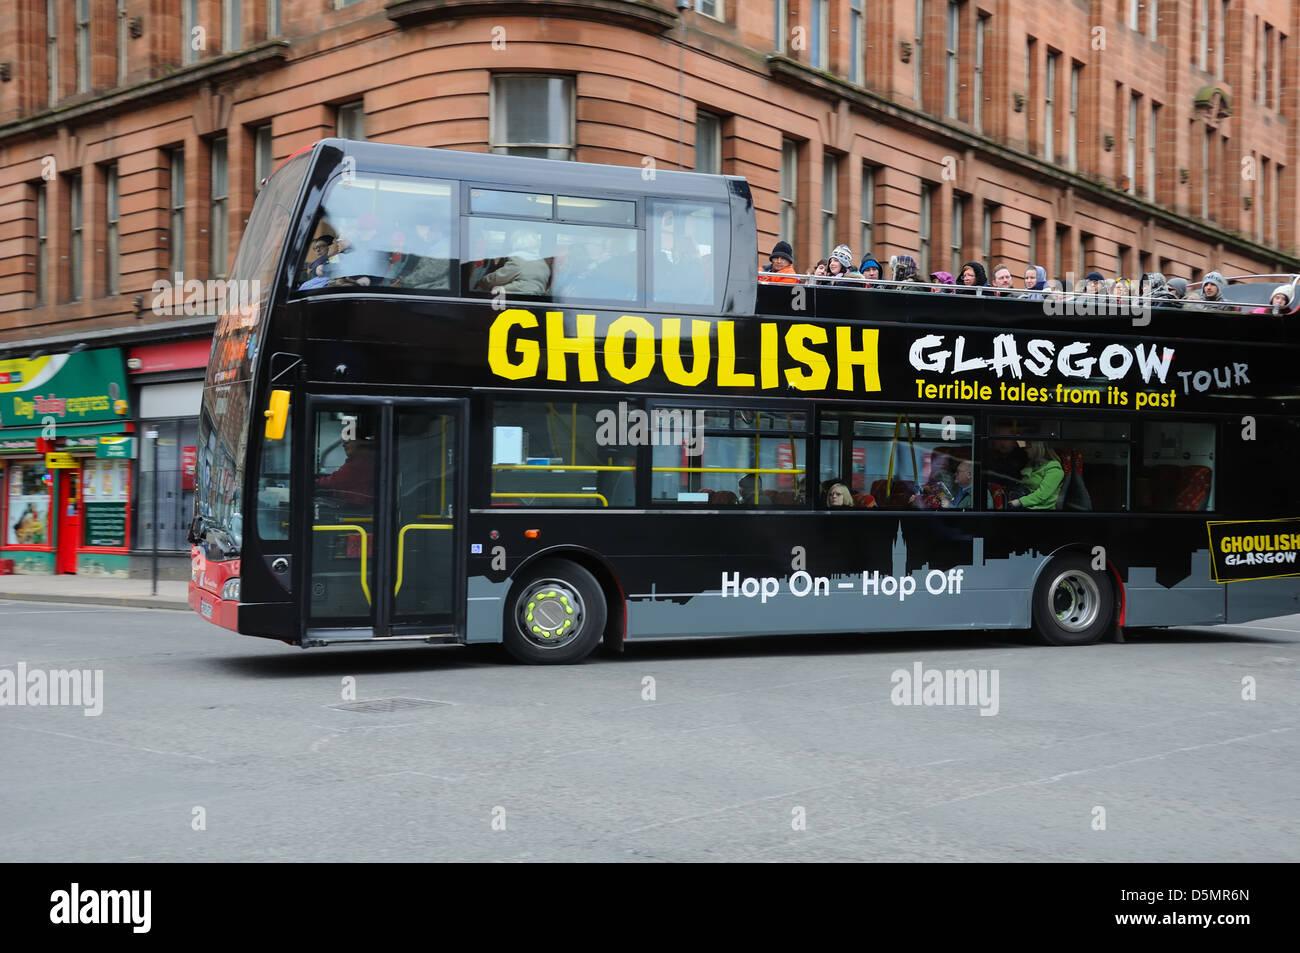 Glasgow open top bus